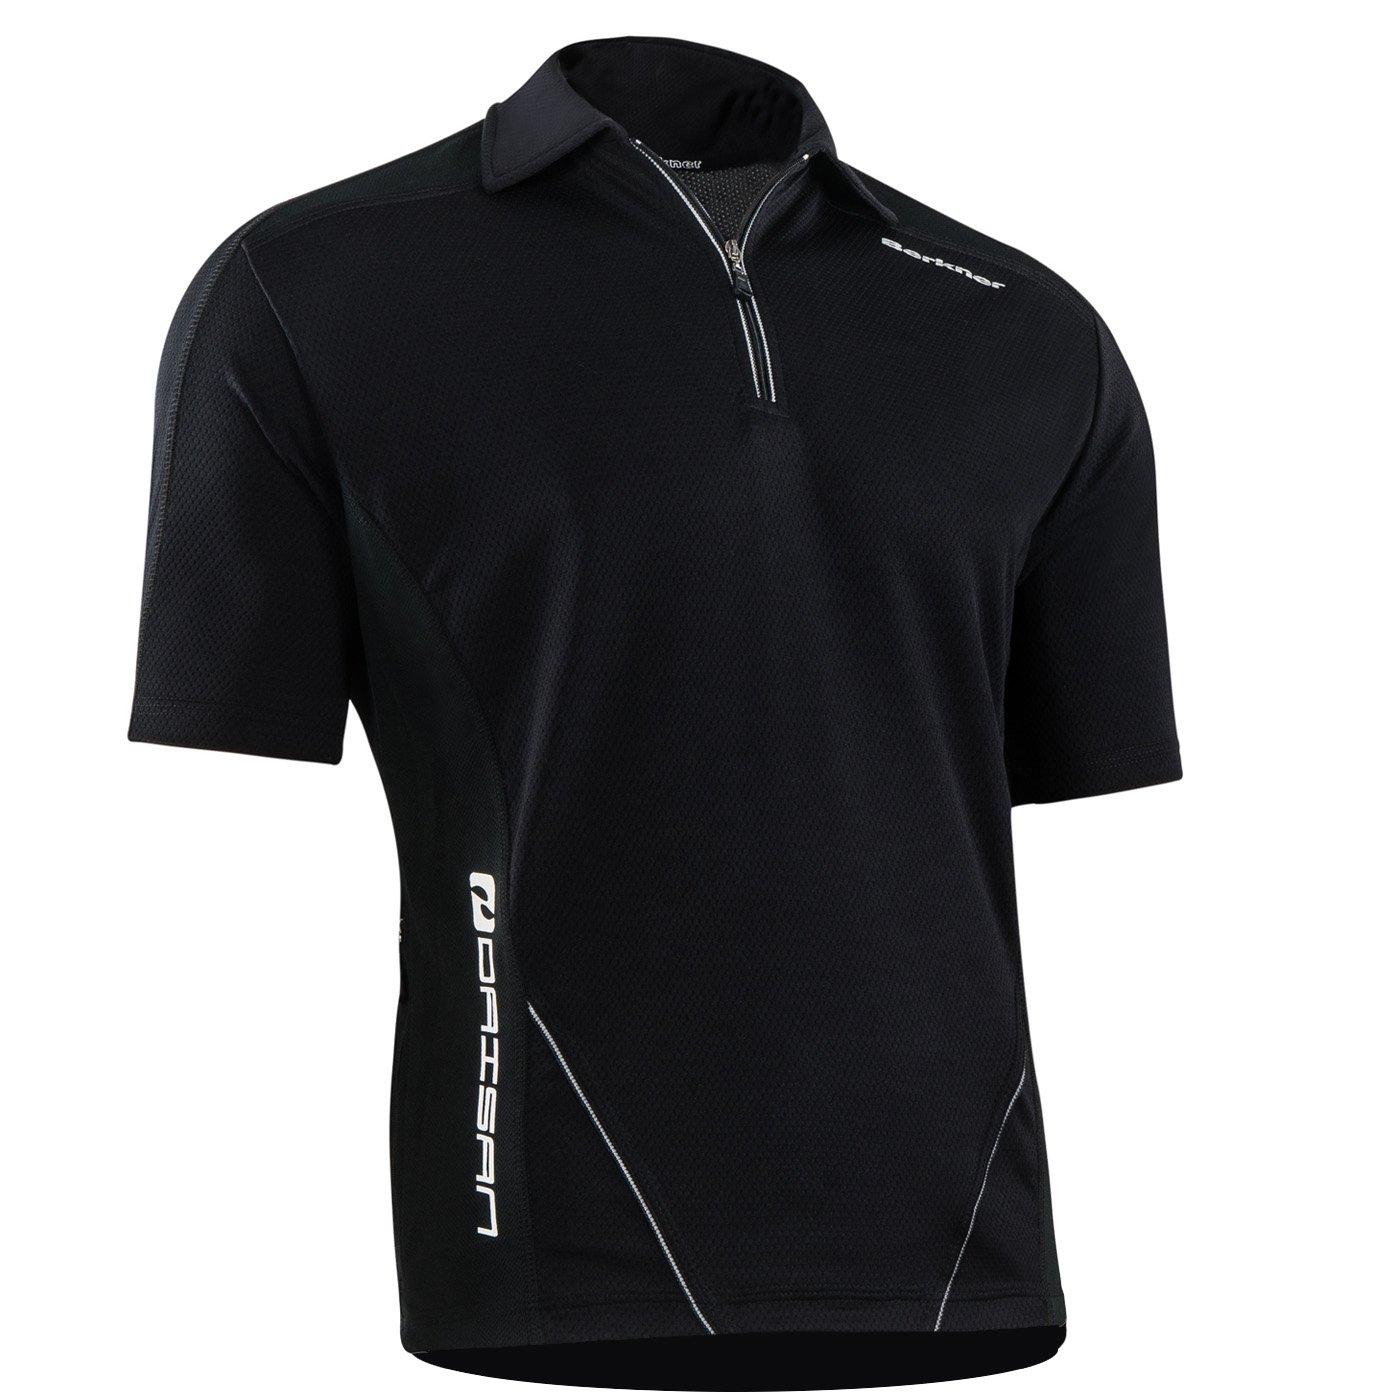 Daisan Team Herren Fahrrad Trikot polo Shirt